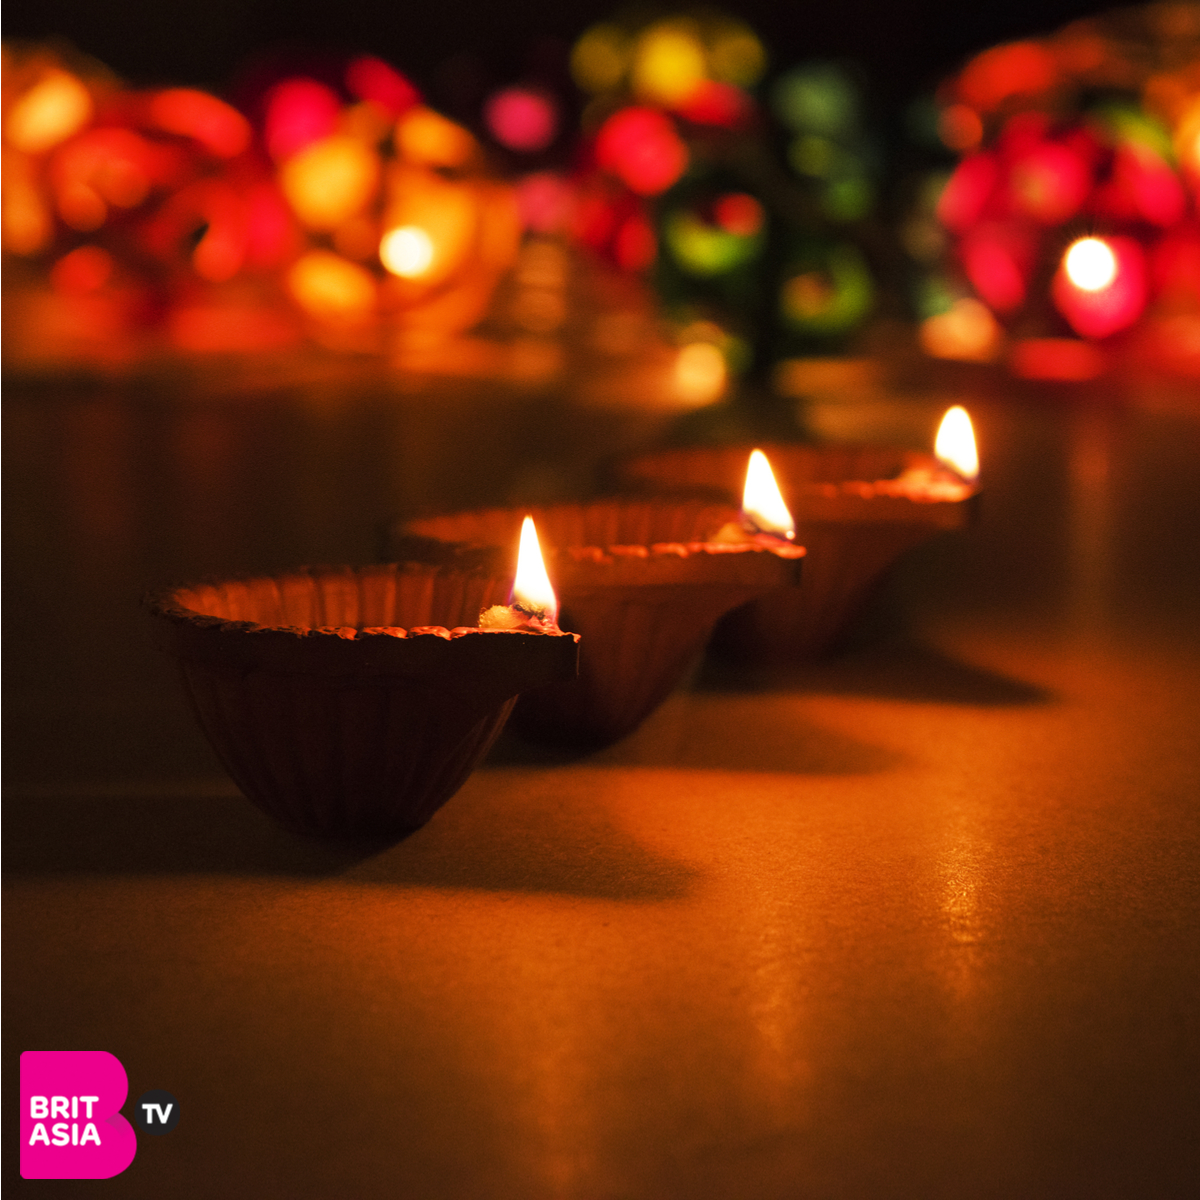 Diyas lit on Diwali